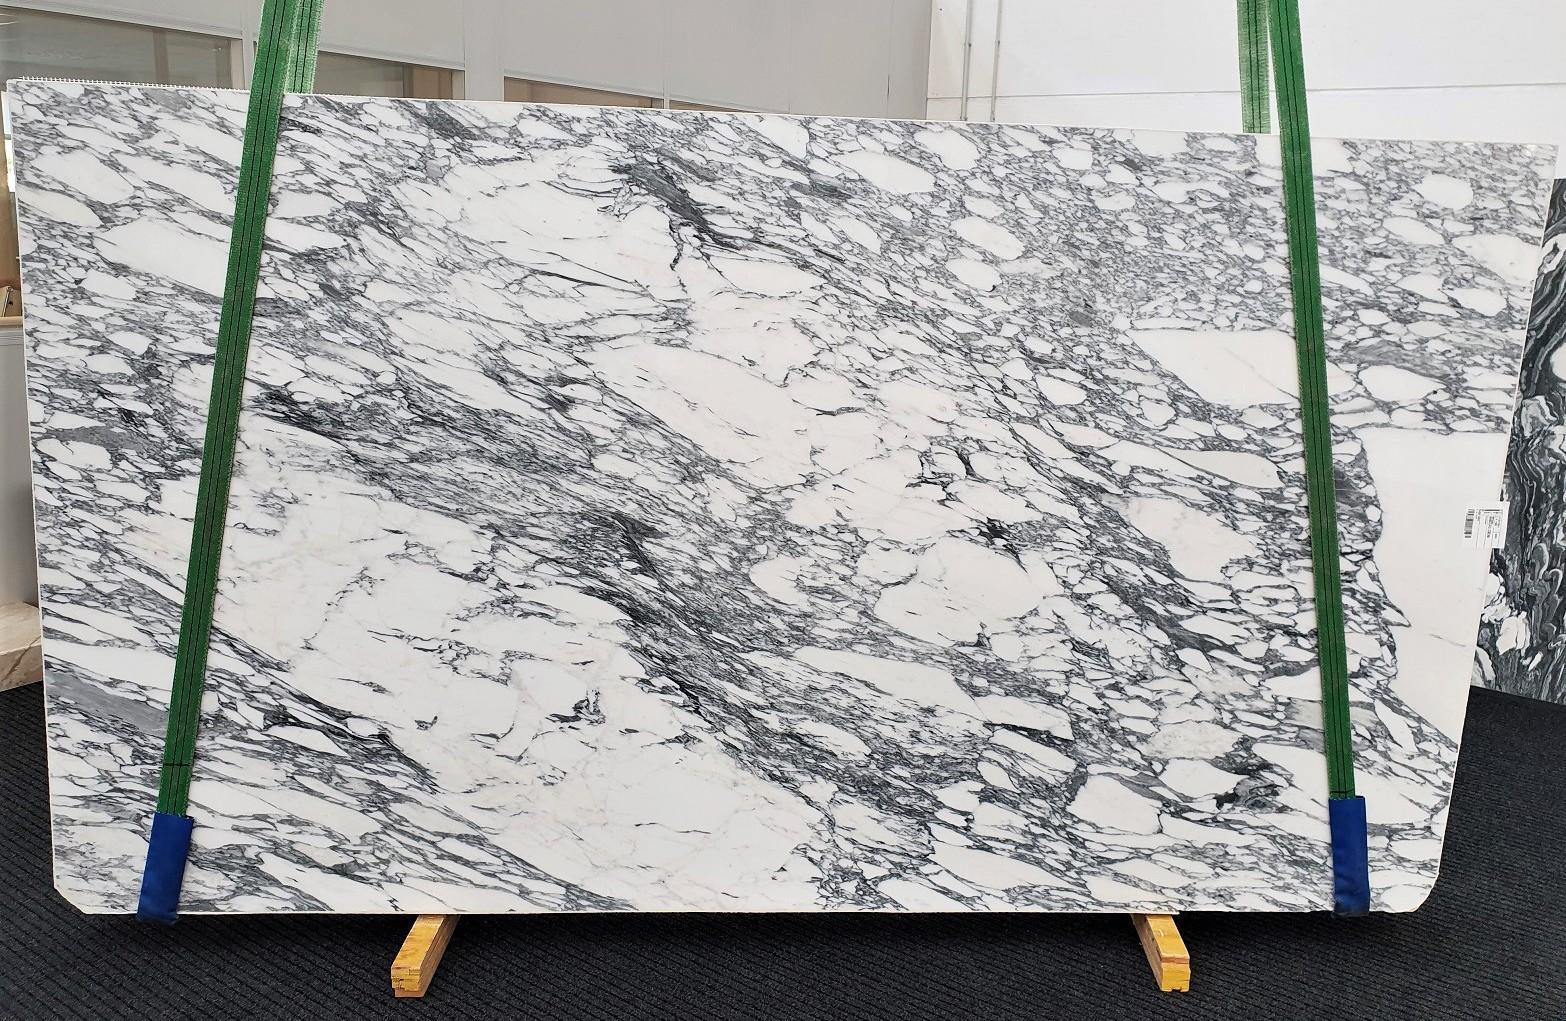 ARABESCATO CORCHIA polierte Unmaßplatten 1420 aus Natur Marmor , Slab #53: Lieferung Veneto, Italien